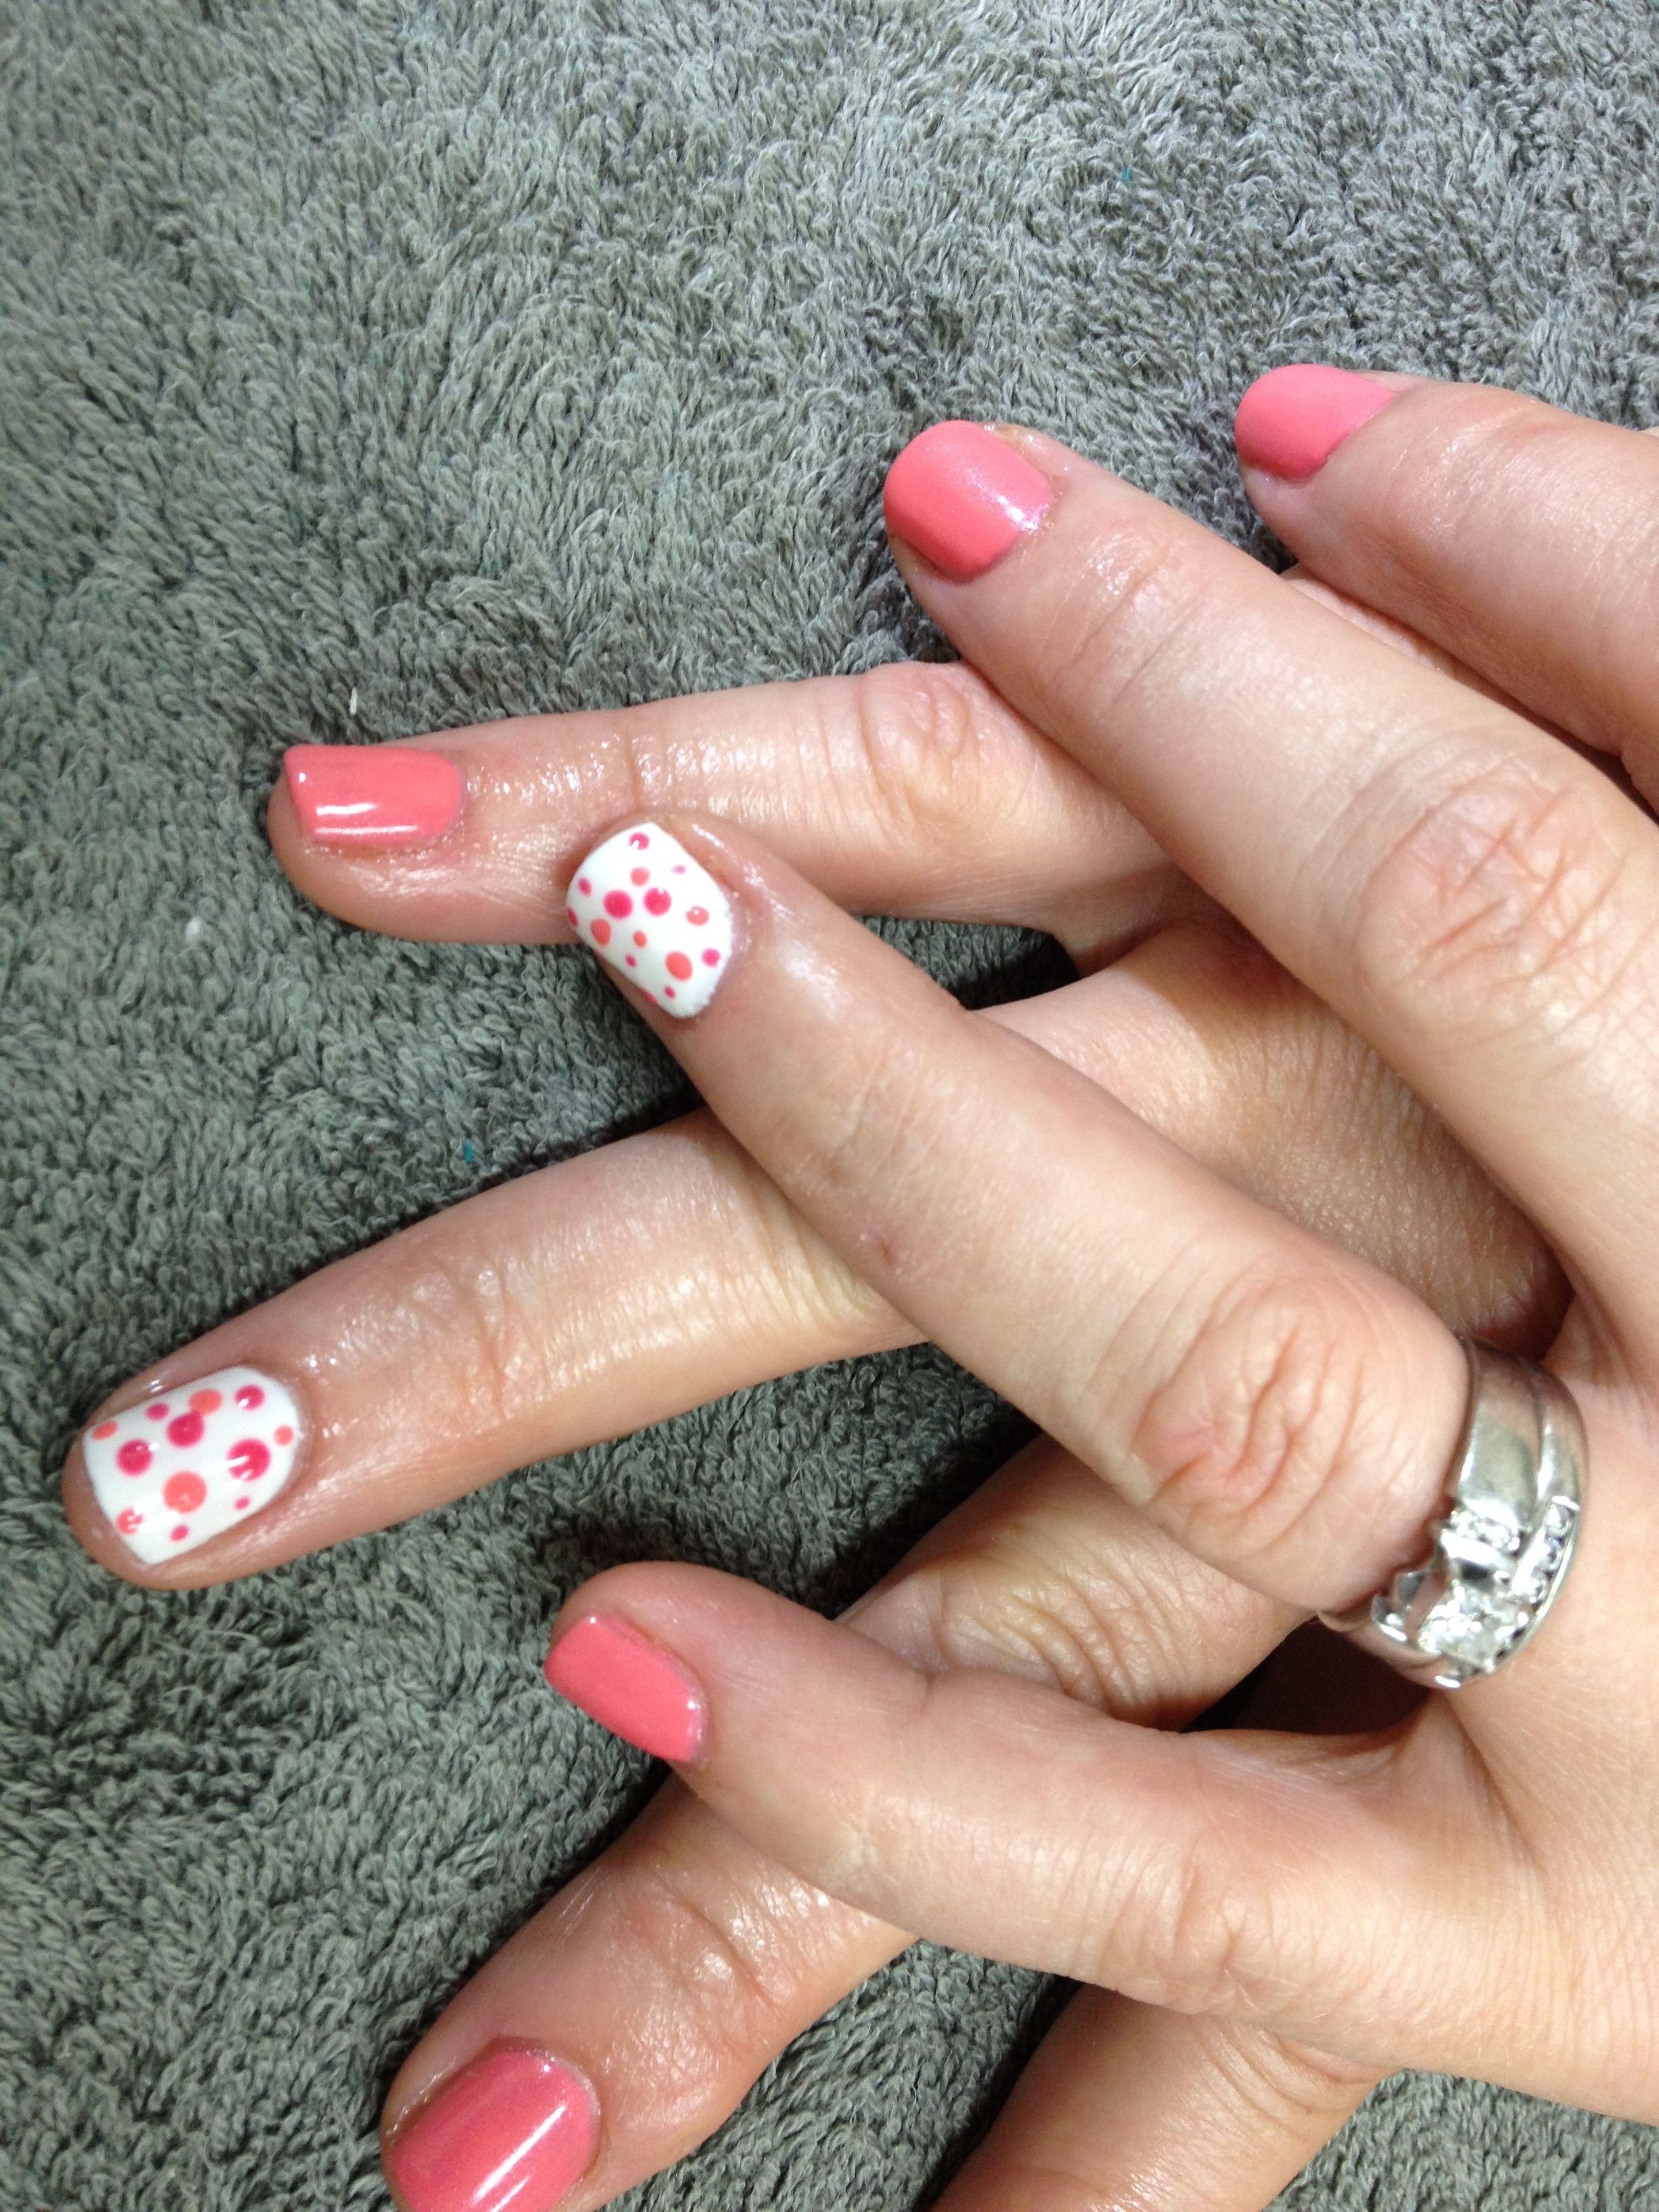 #missblissnails #nails #naildesign #nailart #